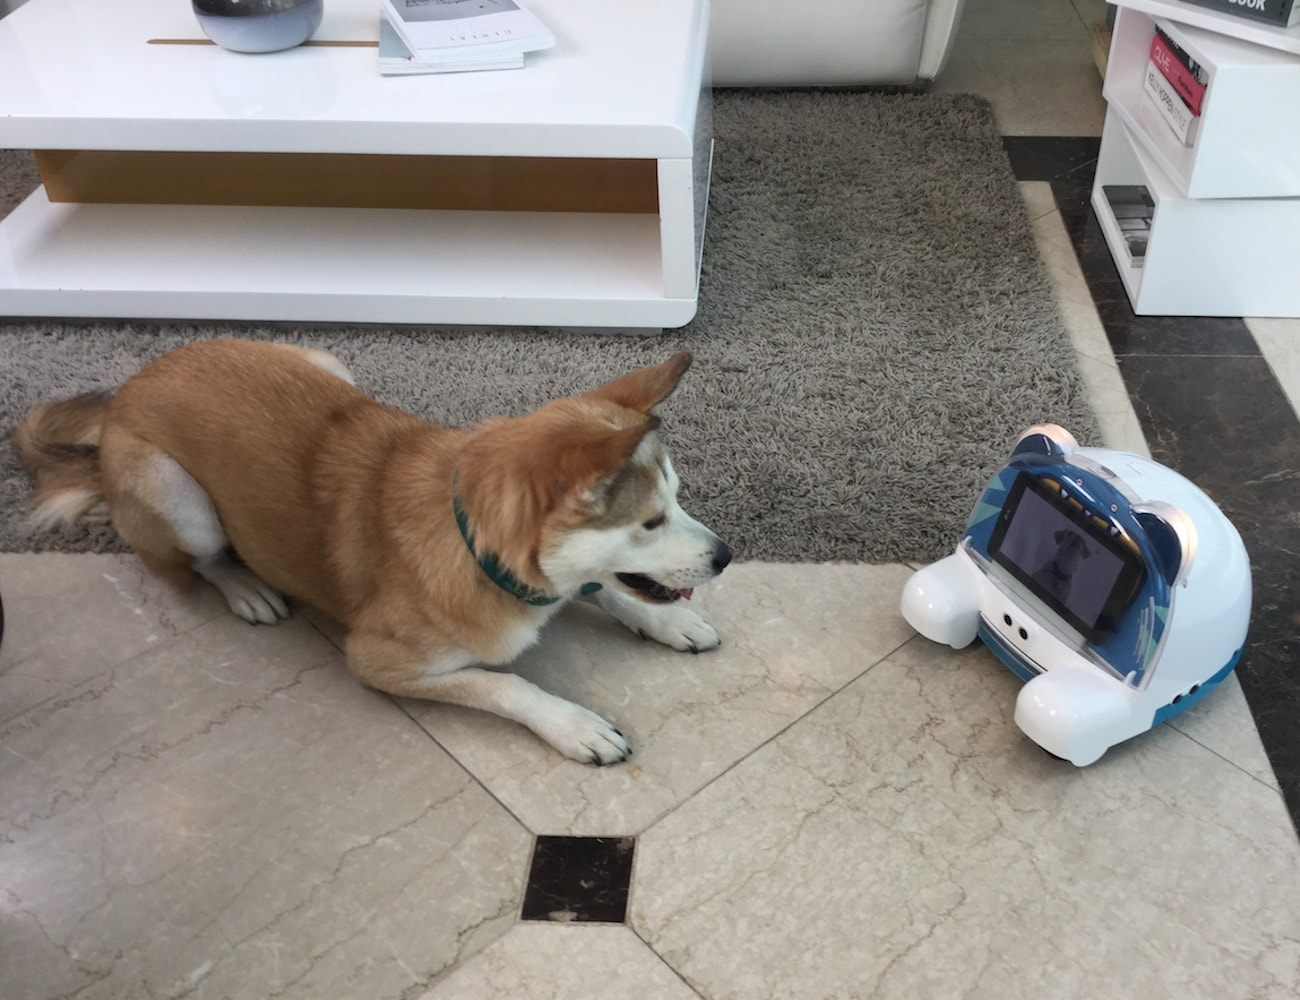 PEDDY Smart Pet Companion Robot